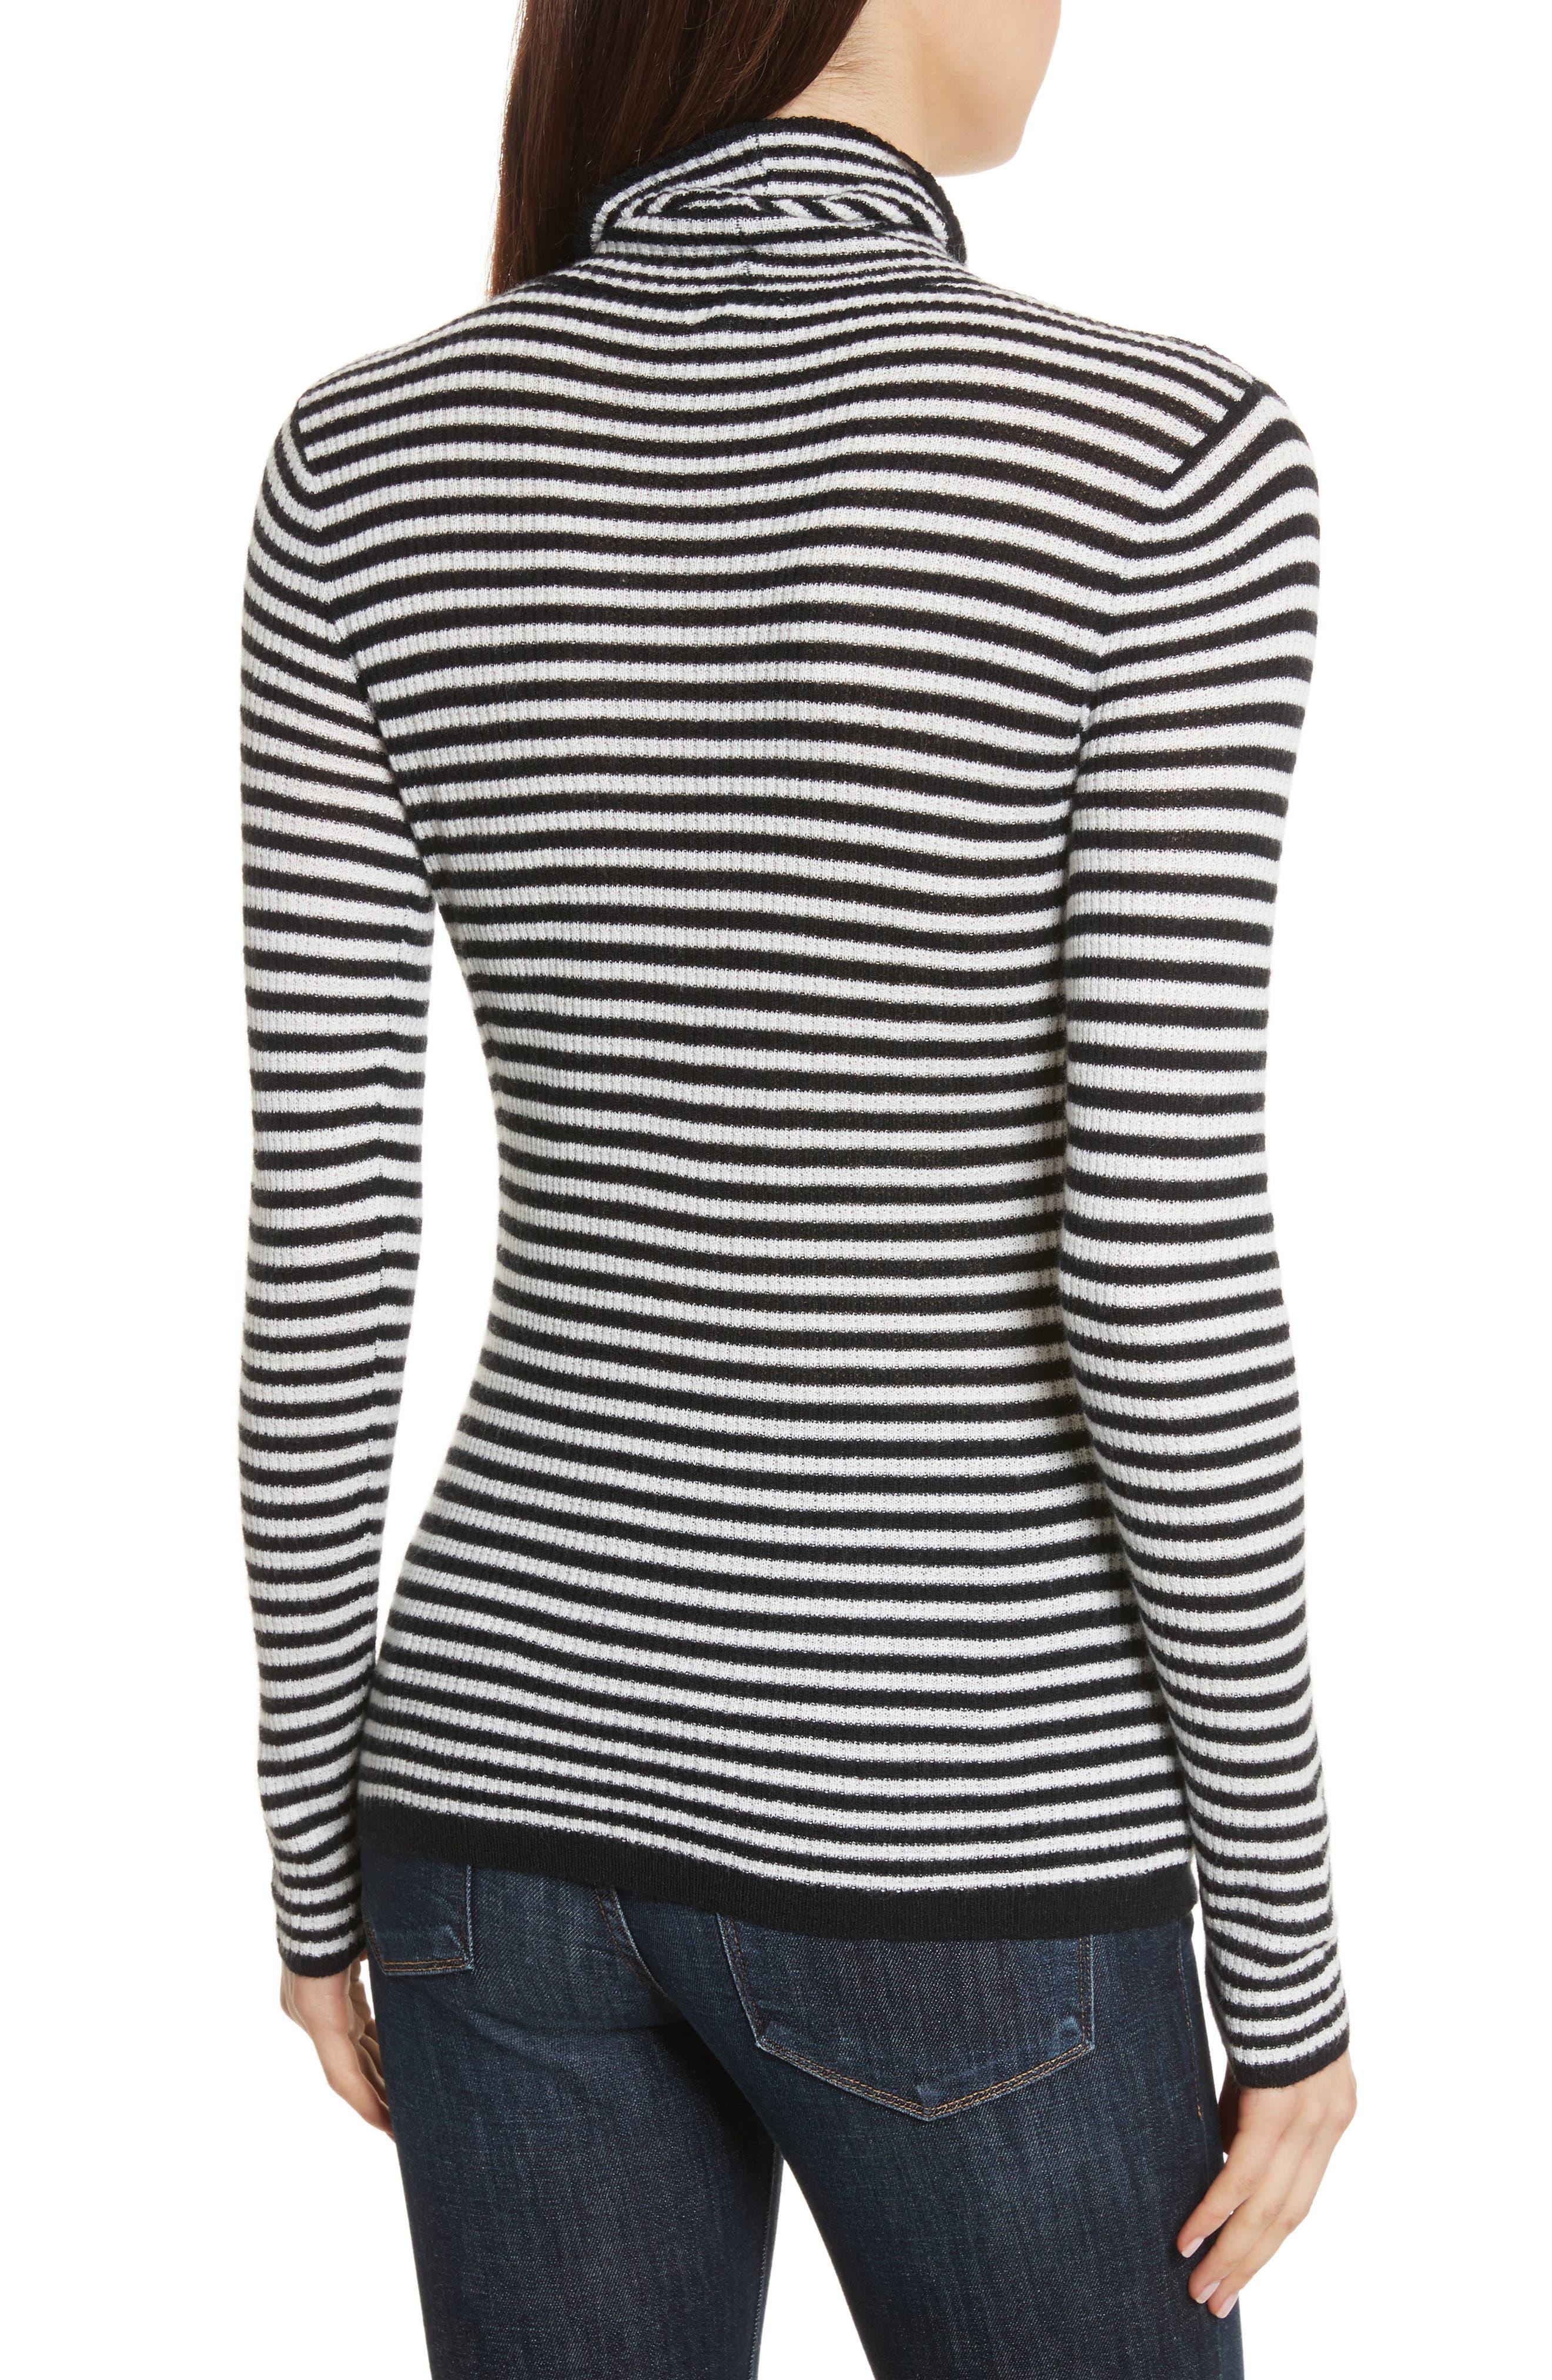 Zelene Stripe Cowl Neck Sweater,                             Alternate thumbnail 2, color,                             Caviar/ Porceclain